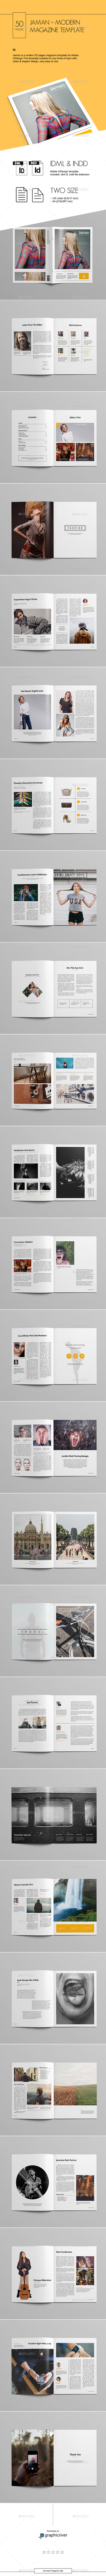 Jaman Modern Magazine Template - Magazines Print Templates